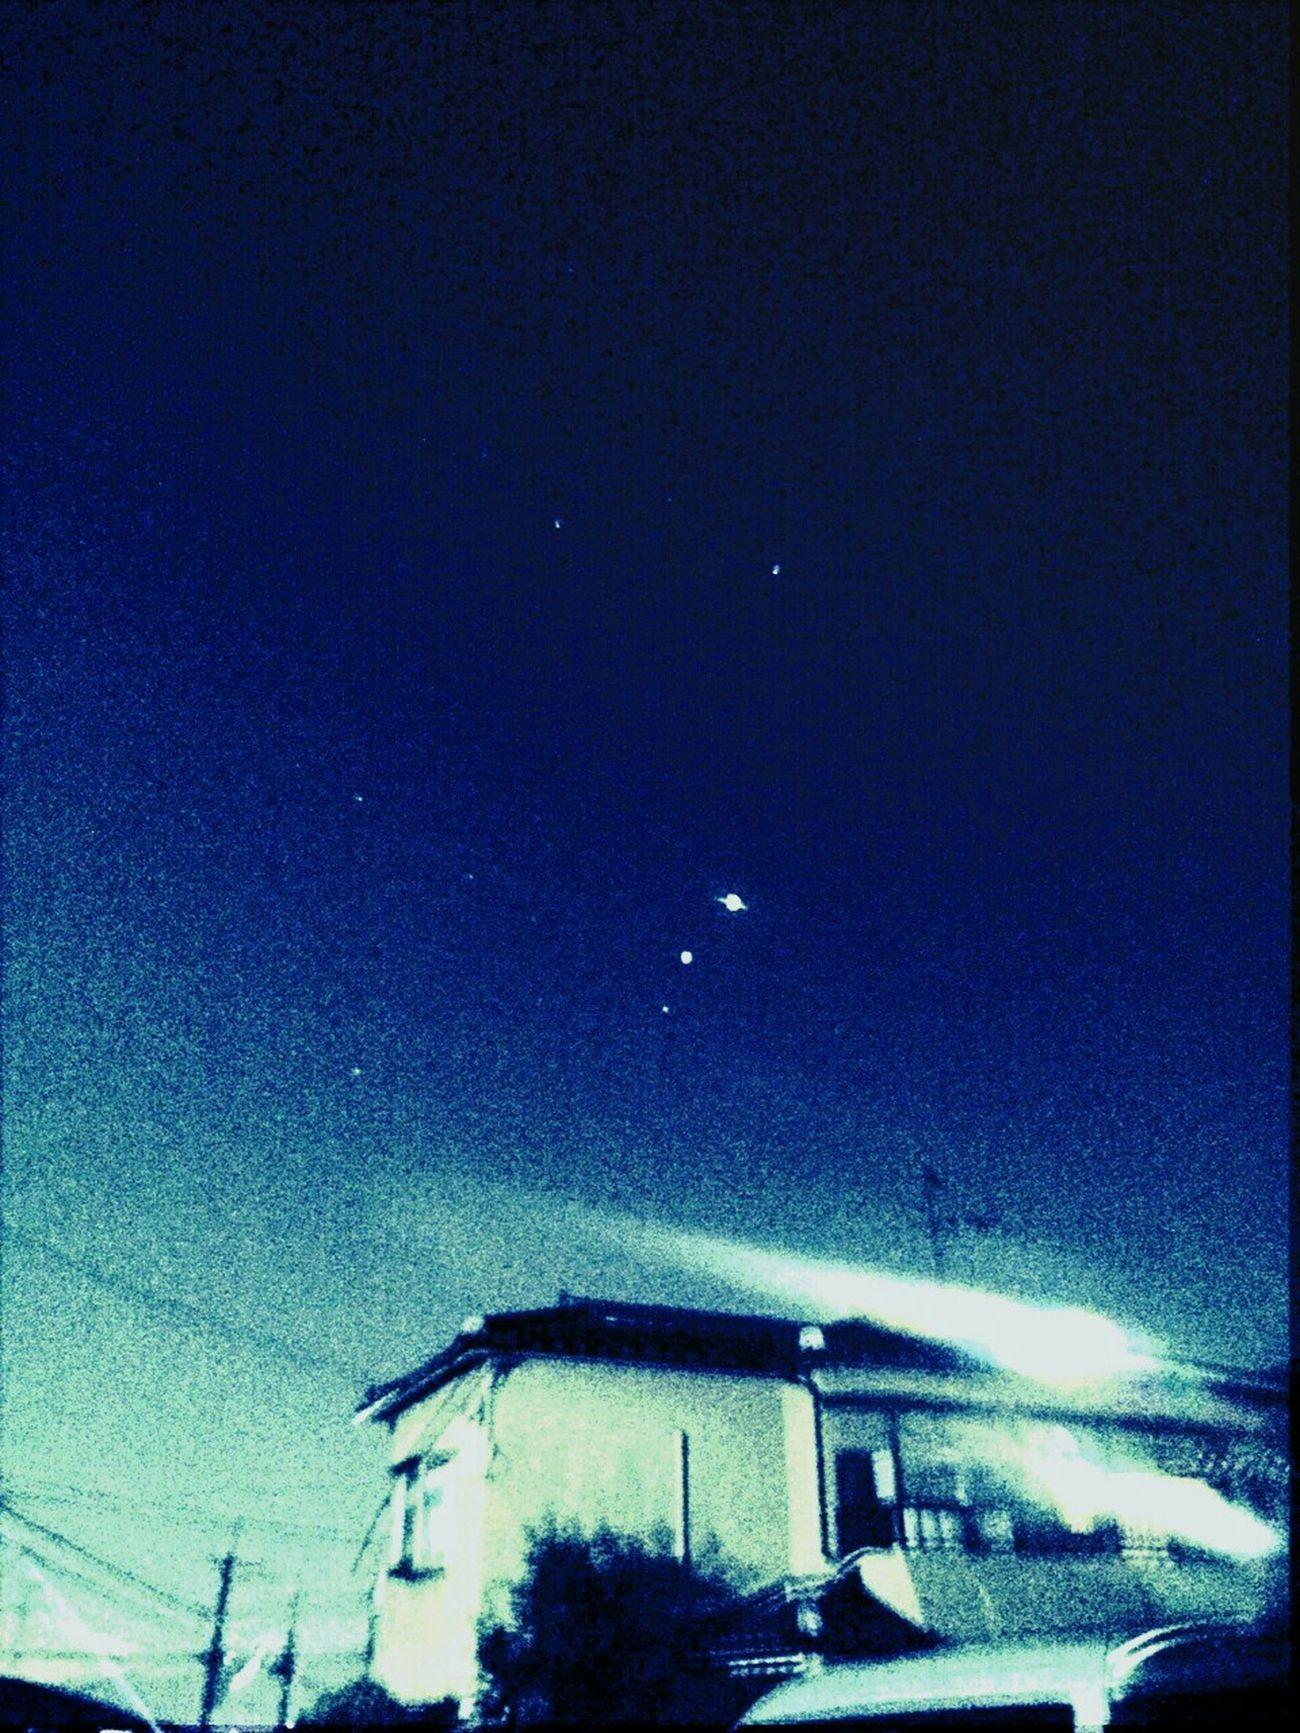 Meteorite🌠 星空 流れ星